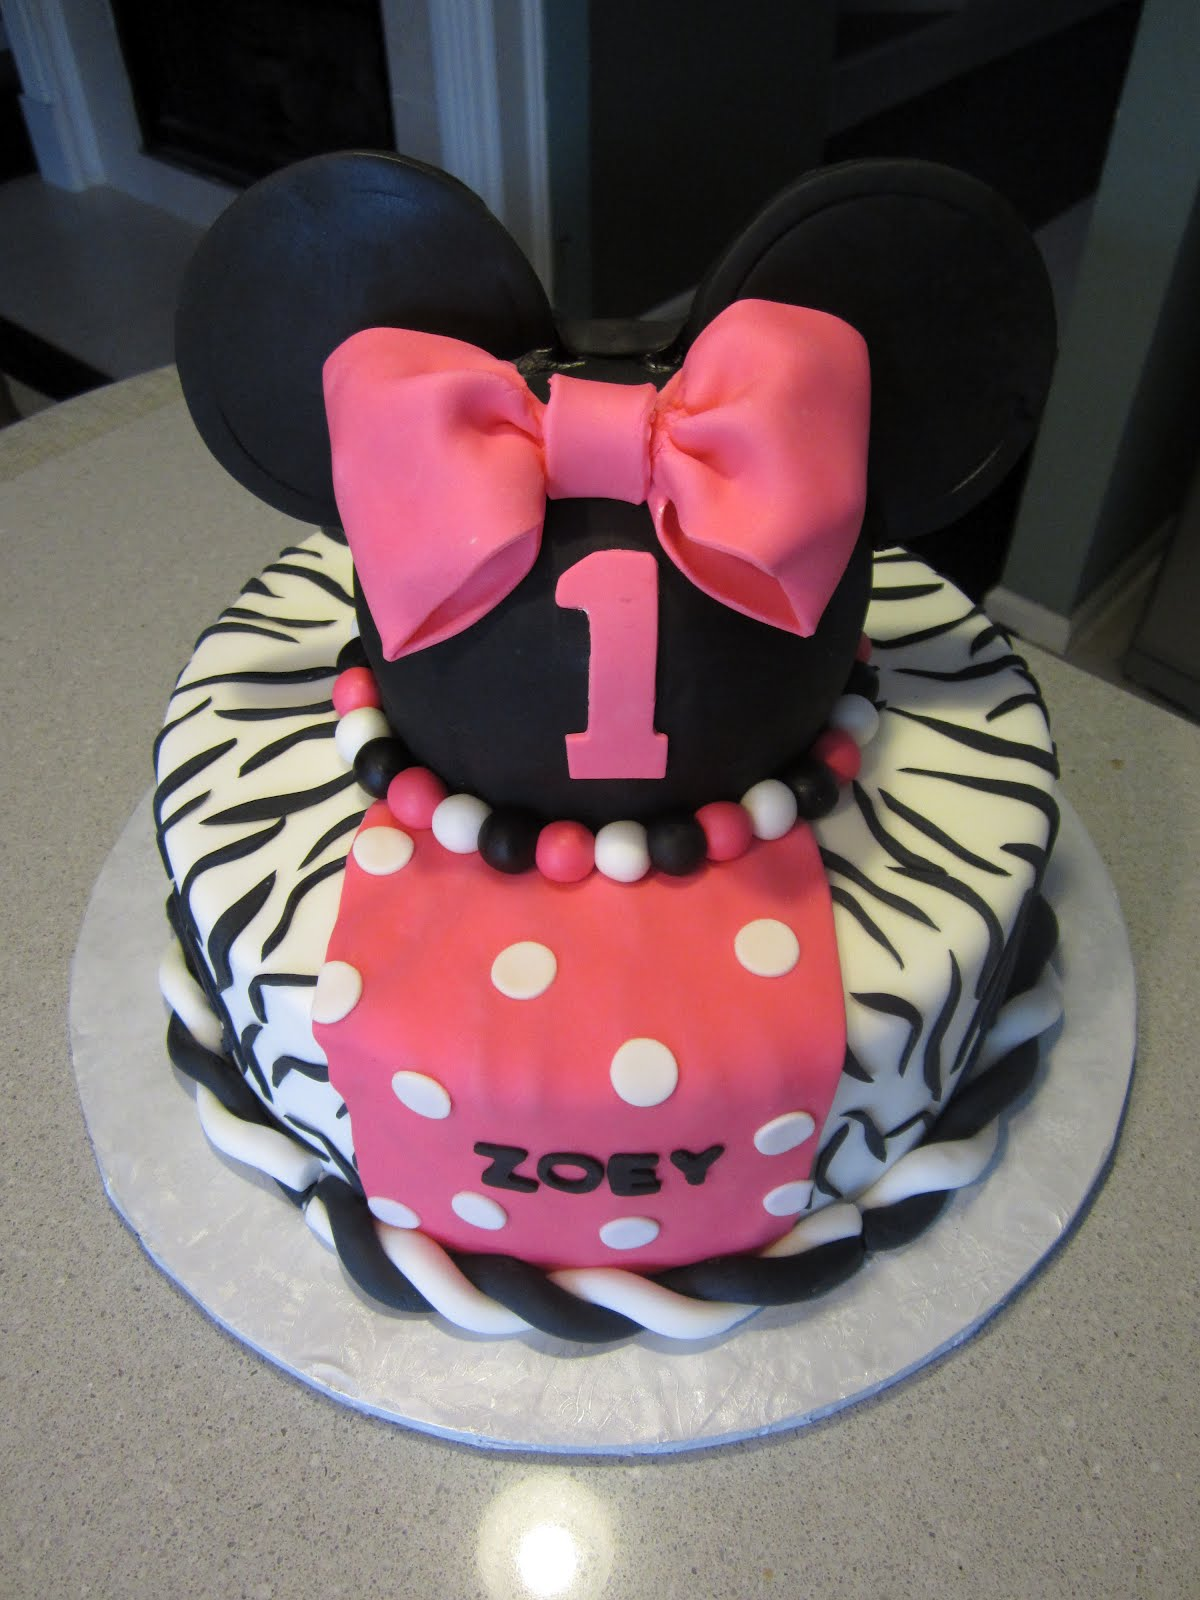 Cakes By Nancy Minnie Mouse in Zebra Print